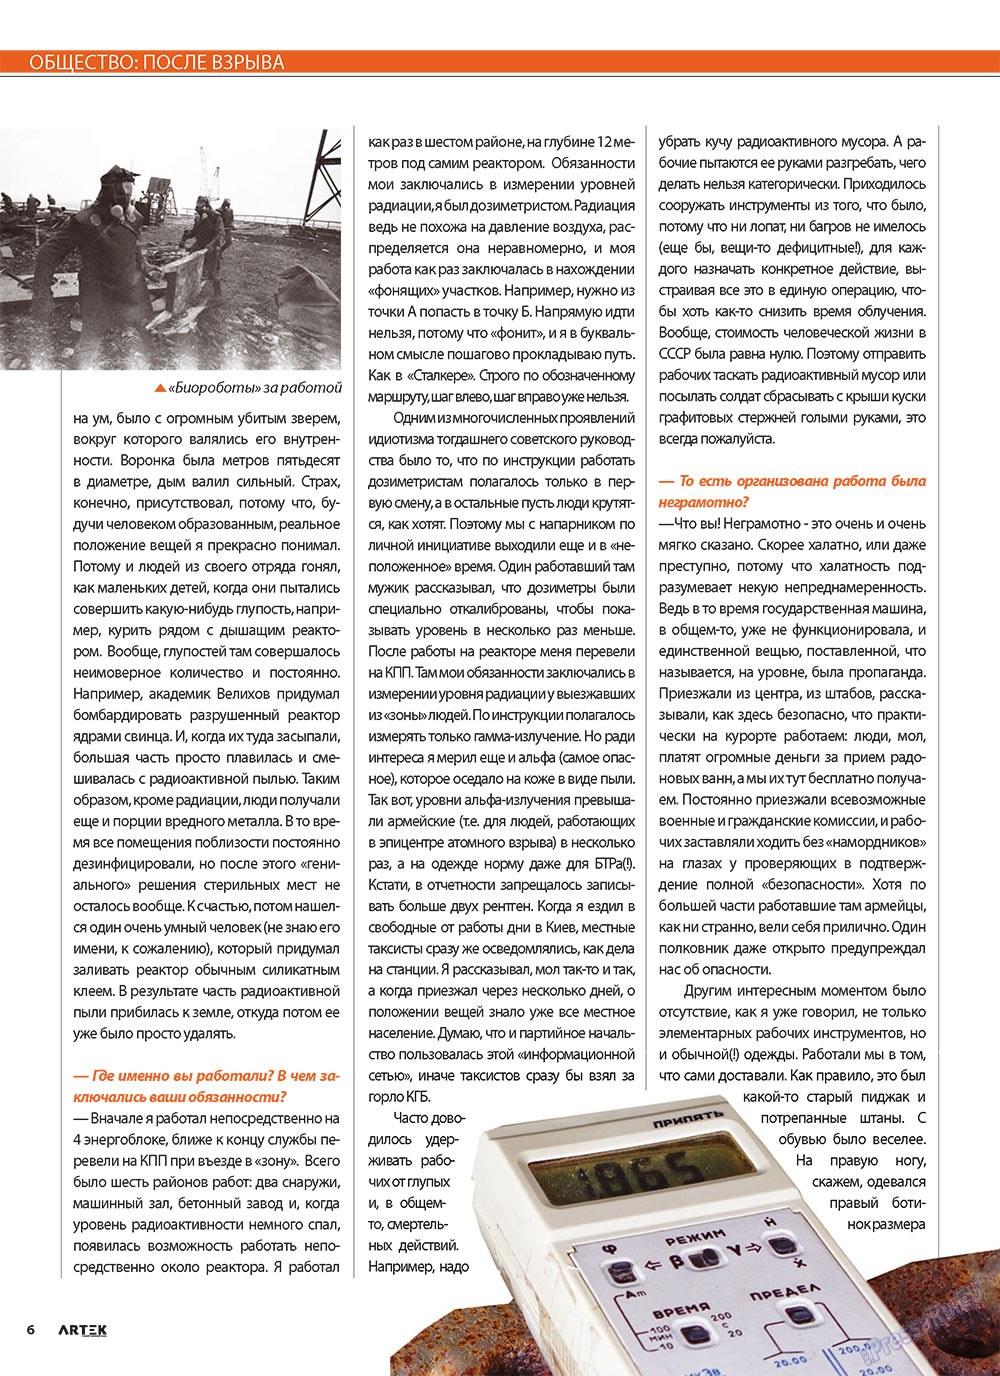 Артек (журнал). 2010 год, номер 2, стр. 8